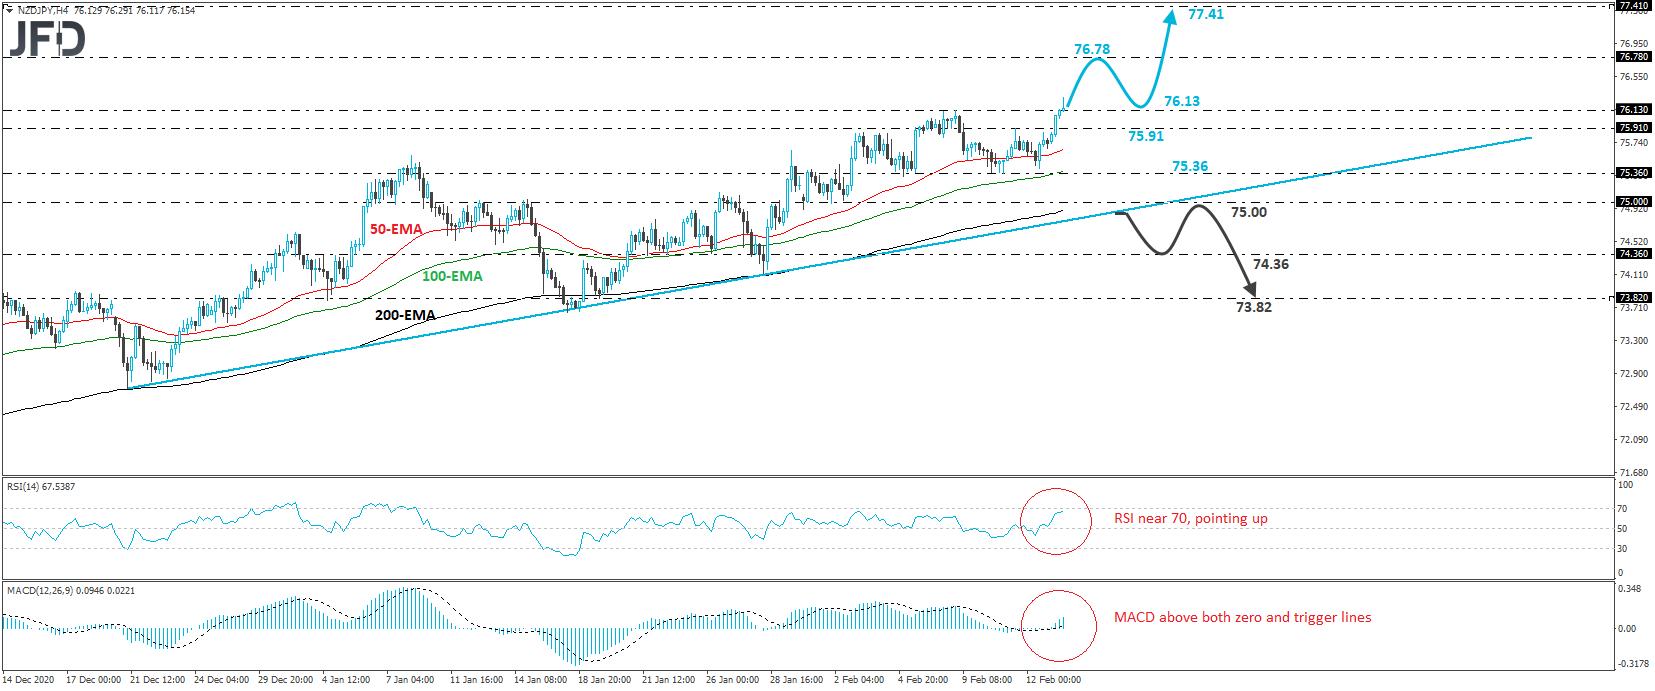 NZD/JPY 4-hour chart technical analysis